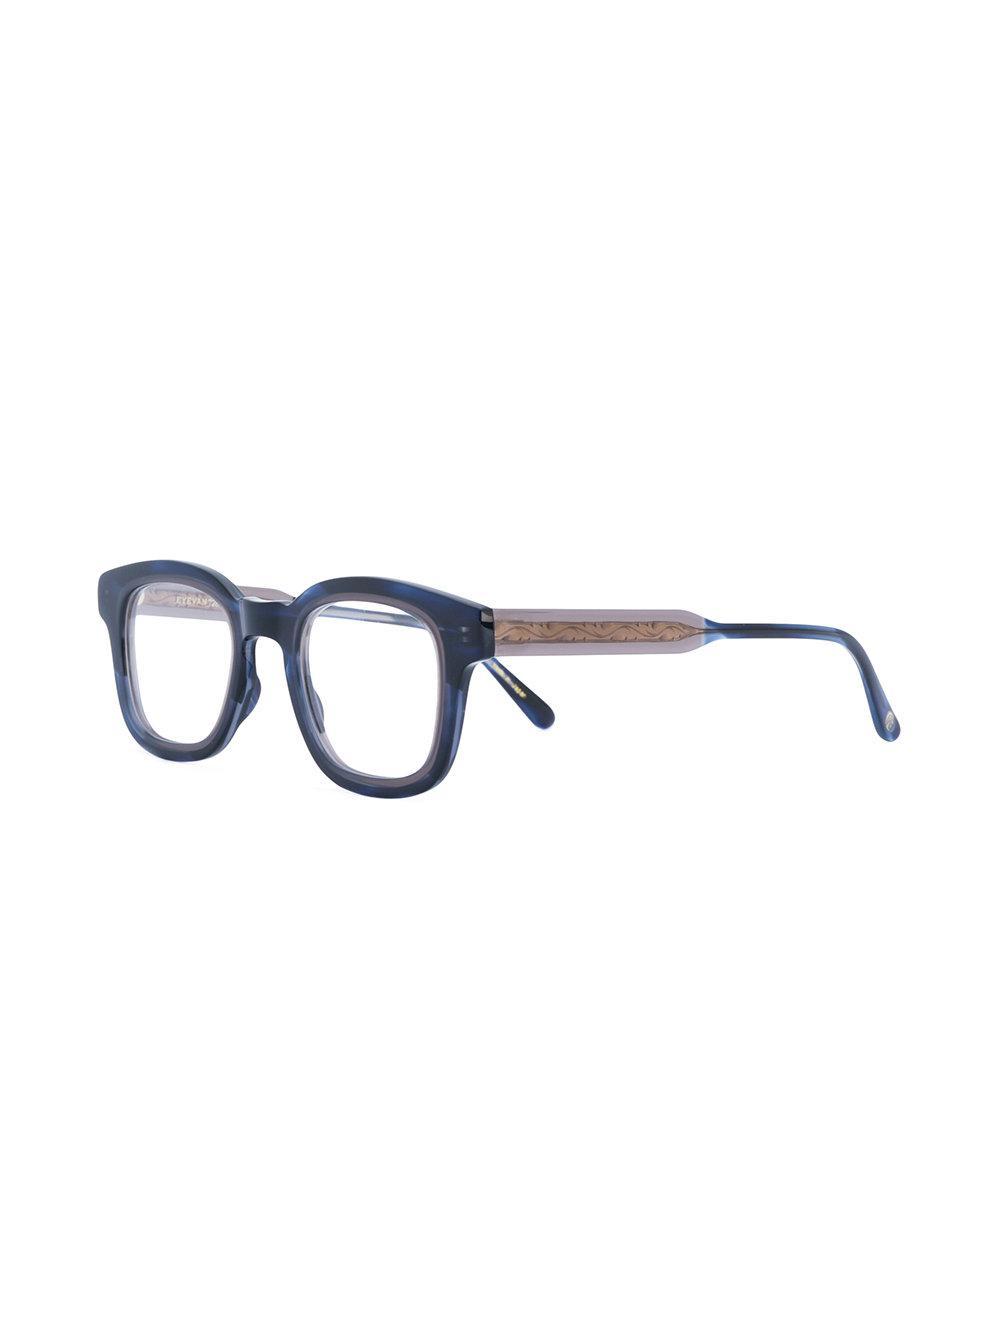 4a95c4cdb5 Eyevan 7285 Marbled Effect Glasses in Black - Lyst